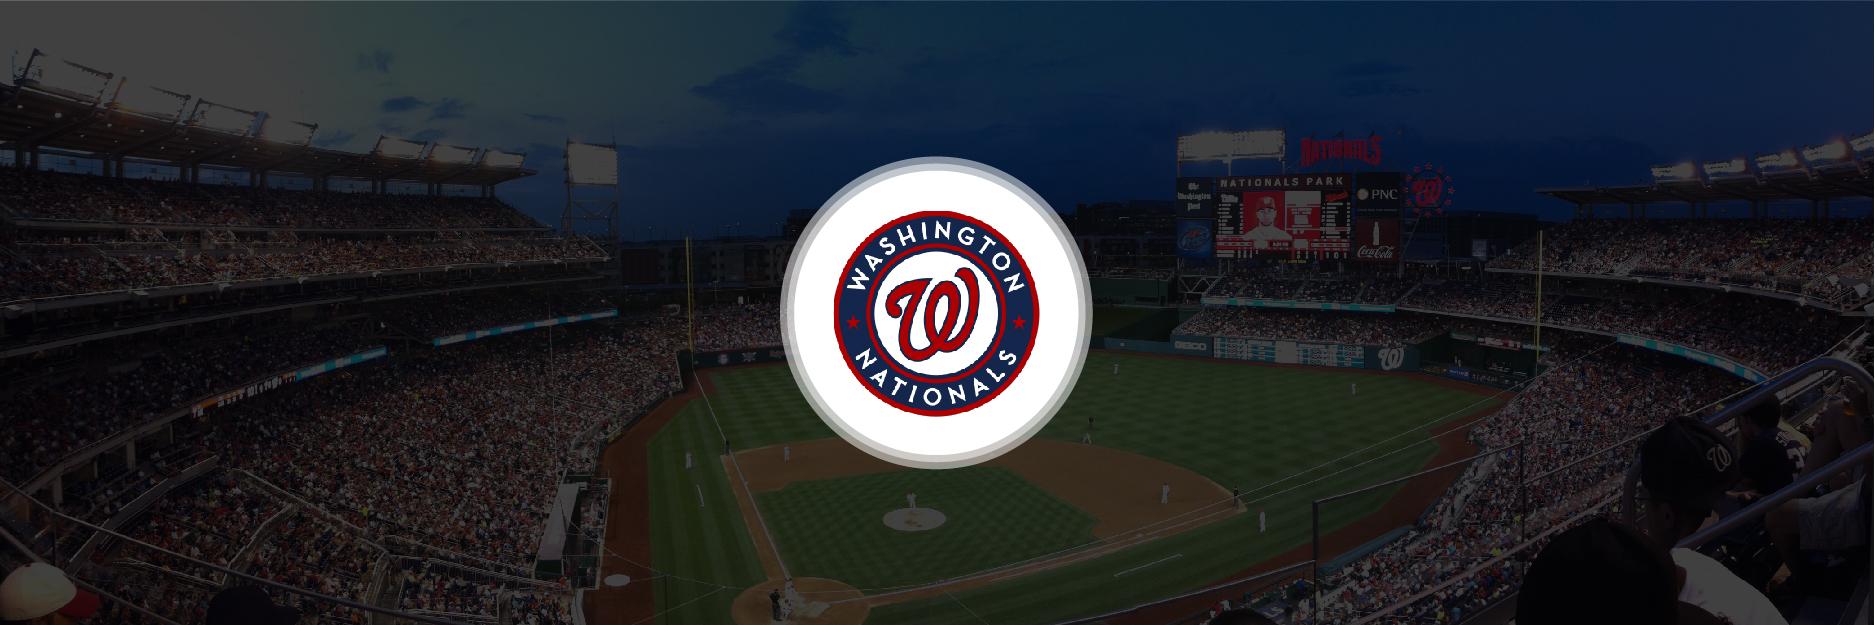 Washington Nationals Analysis Before 2020 Season Start